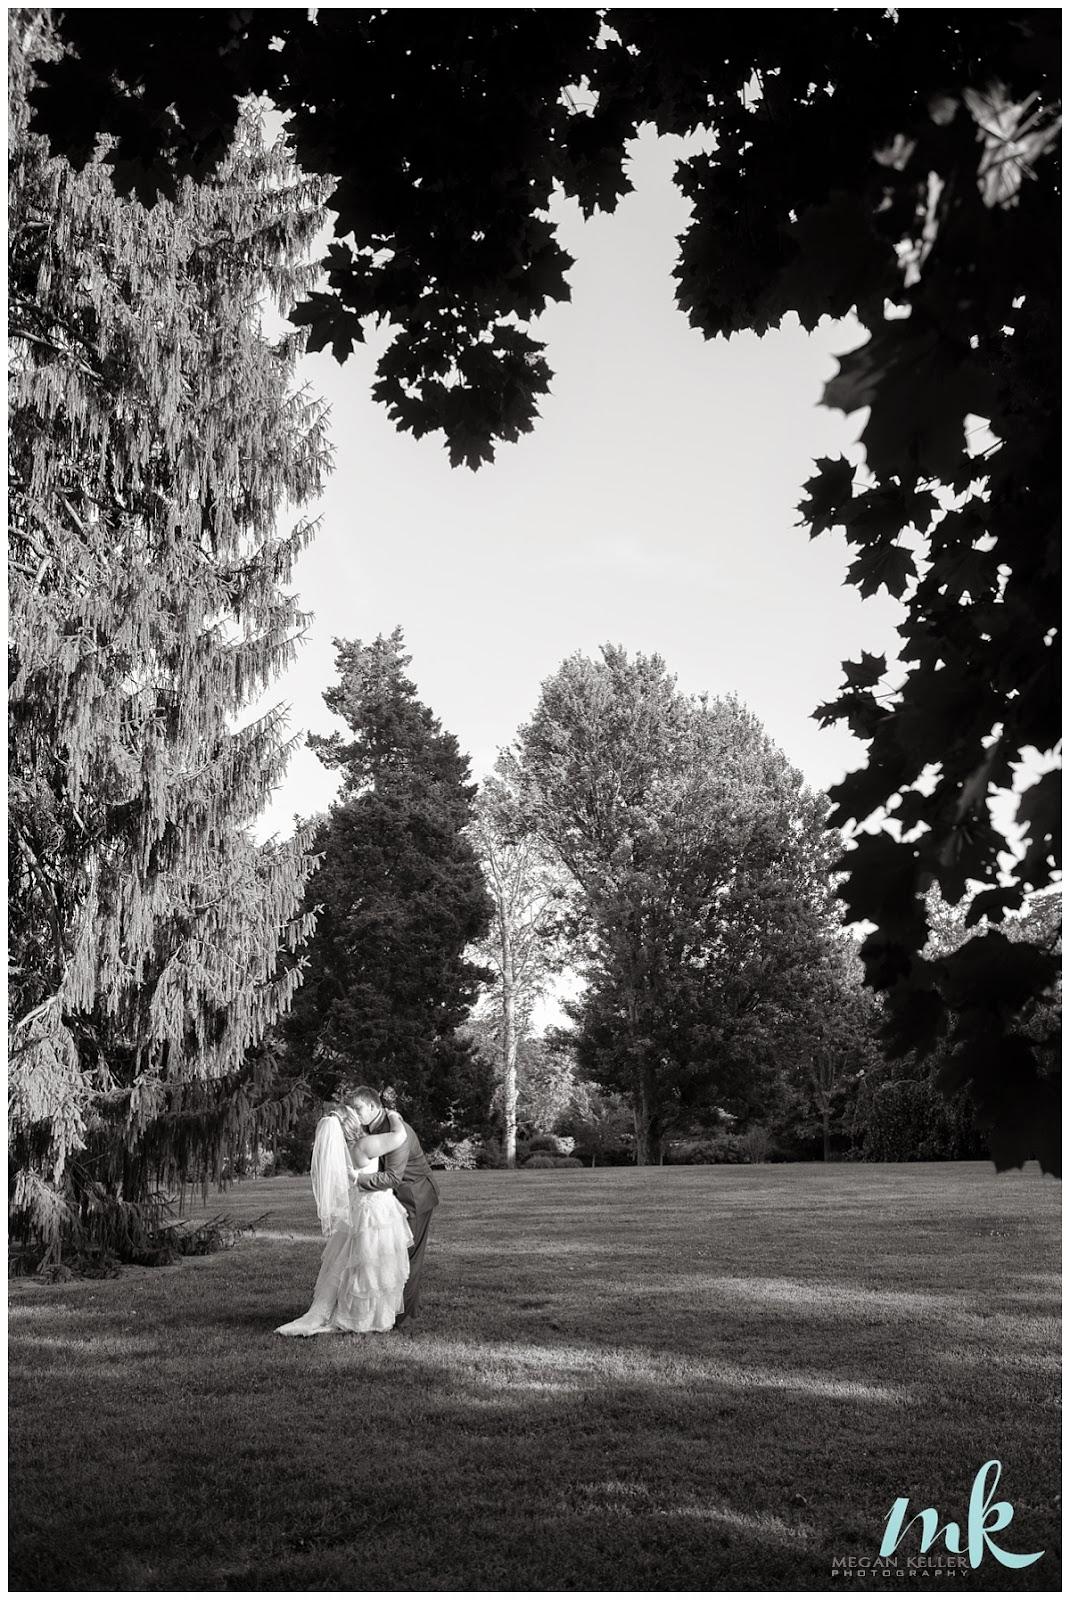 Marissa and Justin's Wedding Marissa and Justin's Wedding 2014 07 30 0012